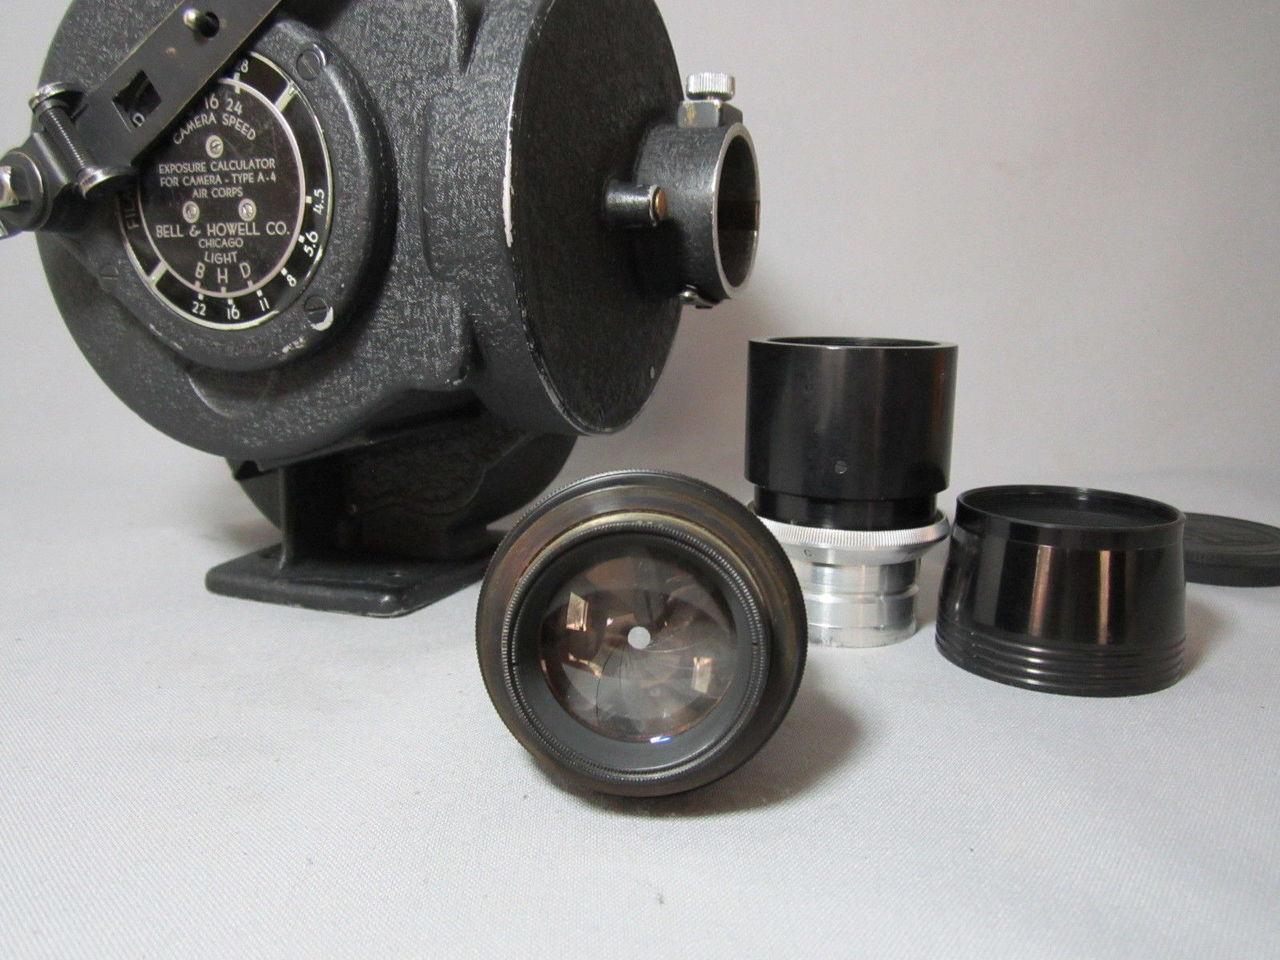 Hand Crank Bell & Howell Eyemo 35mm Movie Camera + 100mm